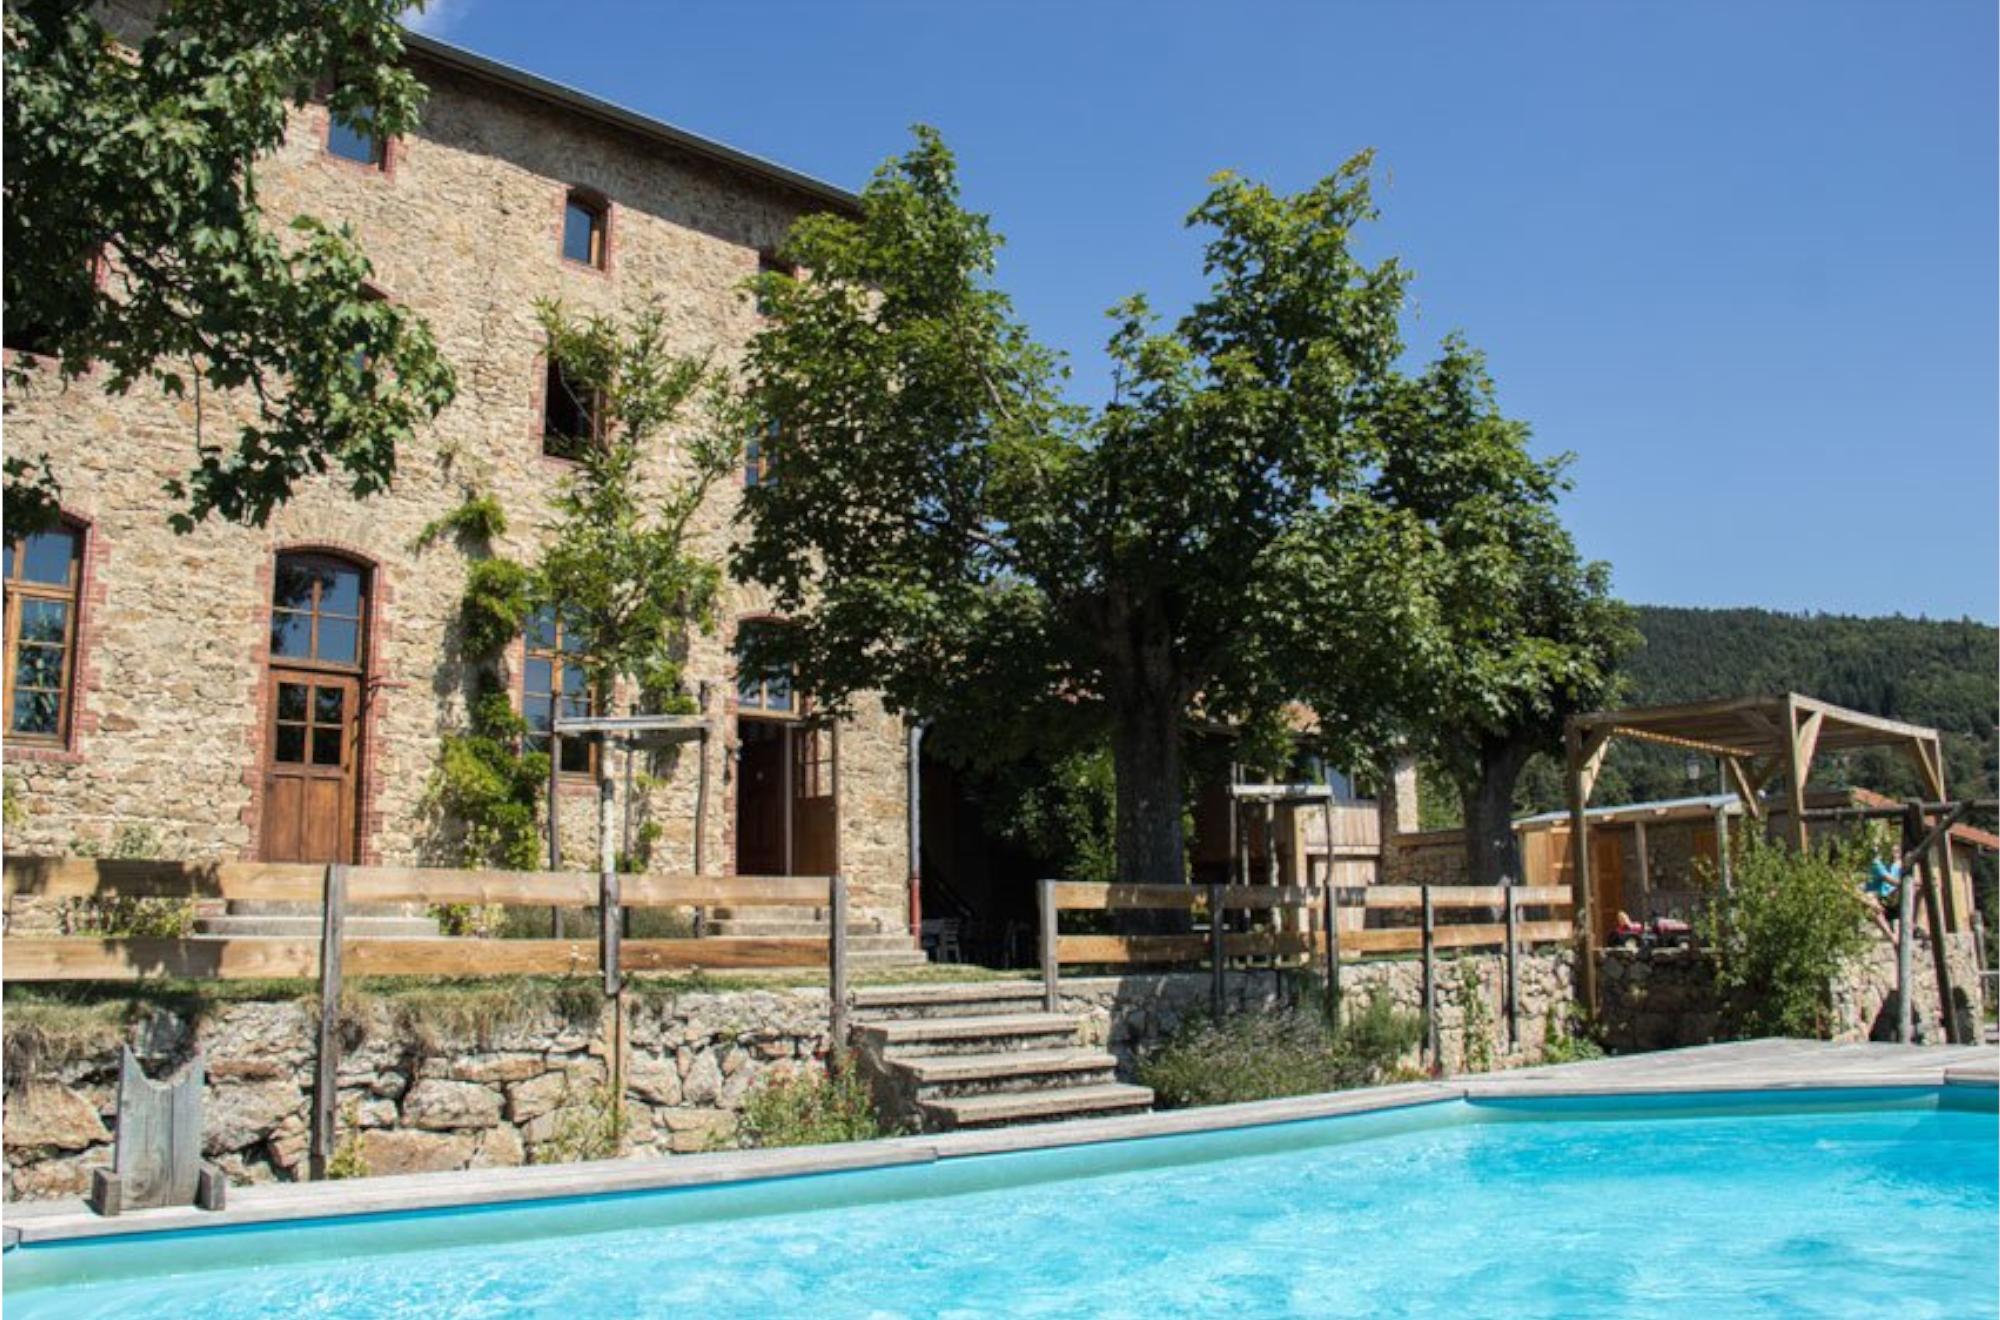 Gîte lOlivonne (Saint-Symphorien-de-Mahun,Ardèche), Furni